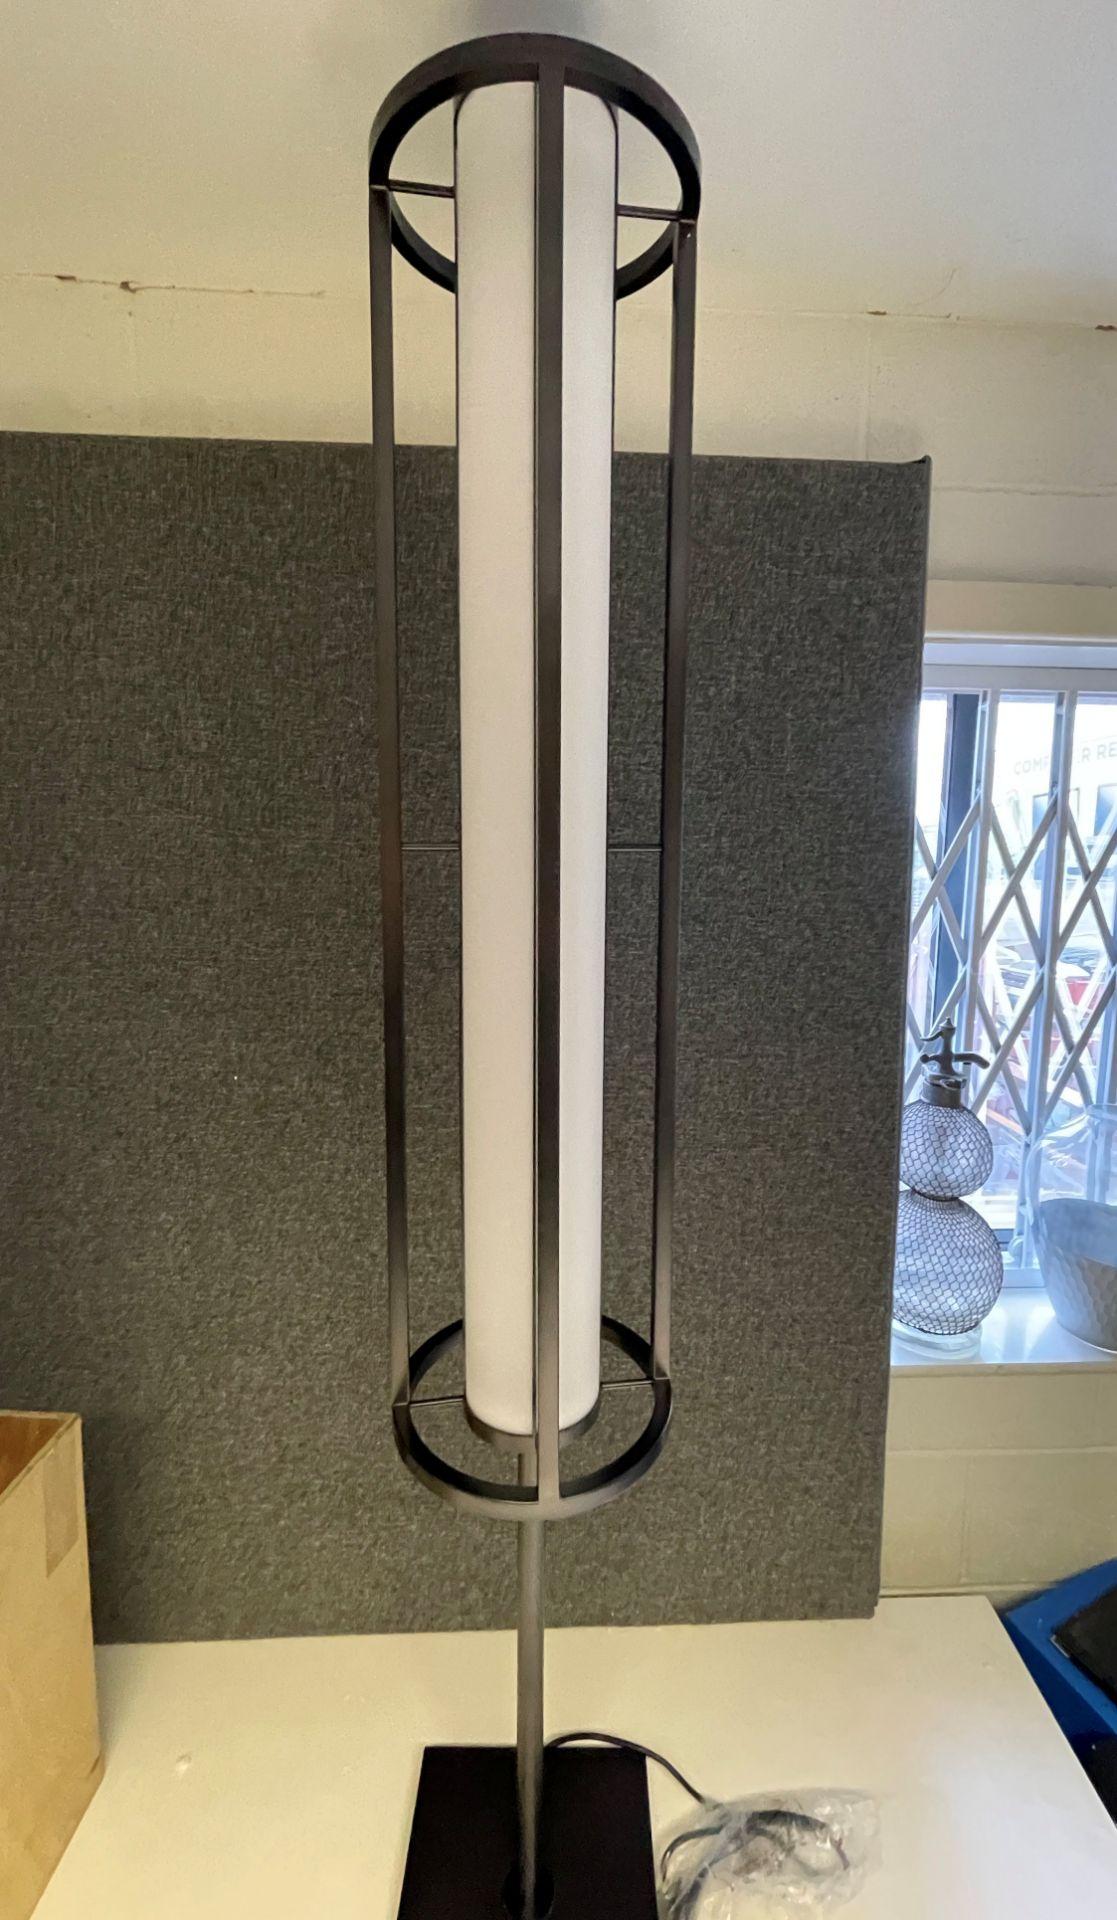 1 x Chelsom Art Deco Style Floor Lamp in Black/Bronze Height 161cm x 30cm Diameter - Ref: CHL197 - - Image 3 of 10